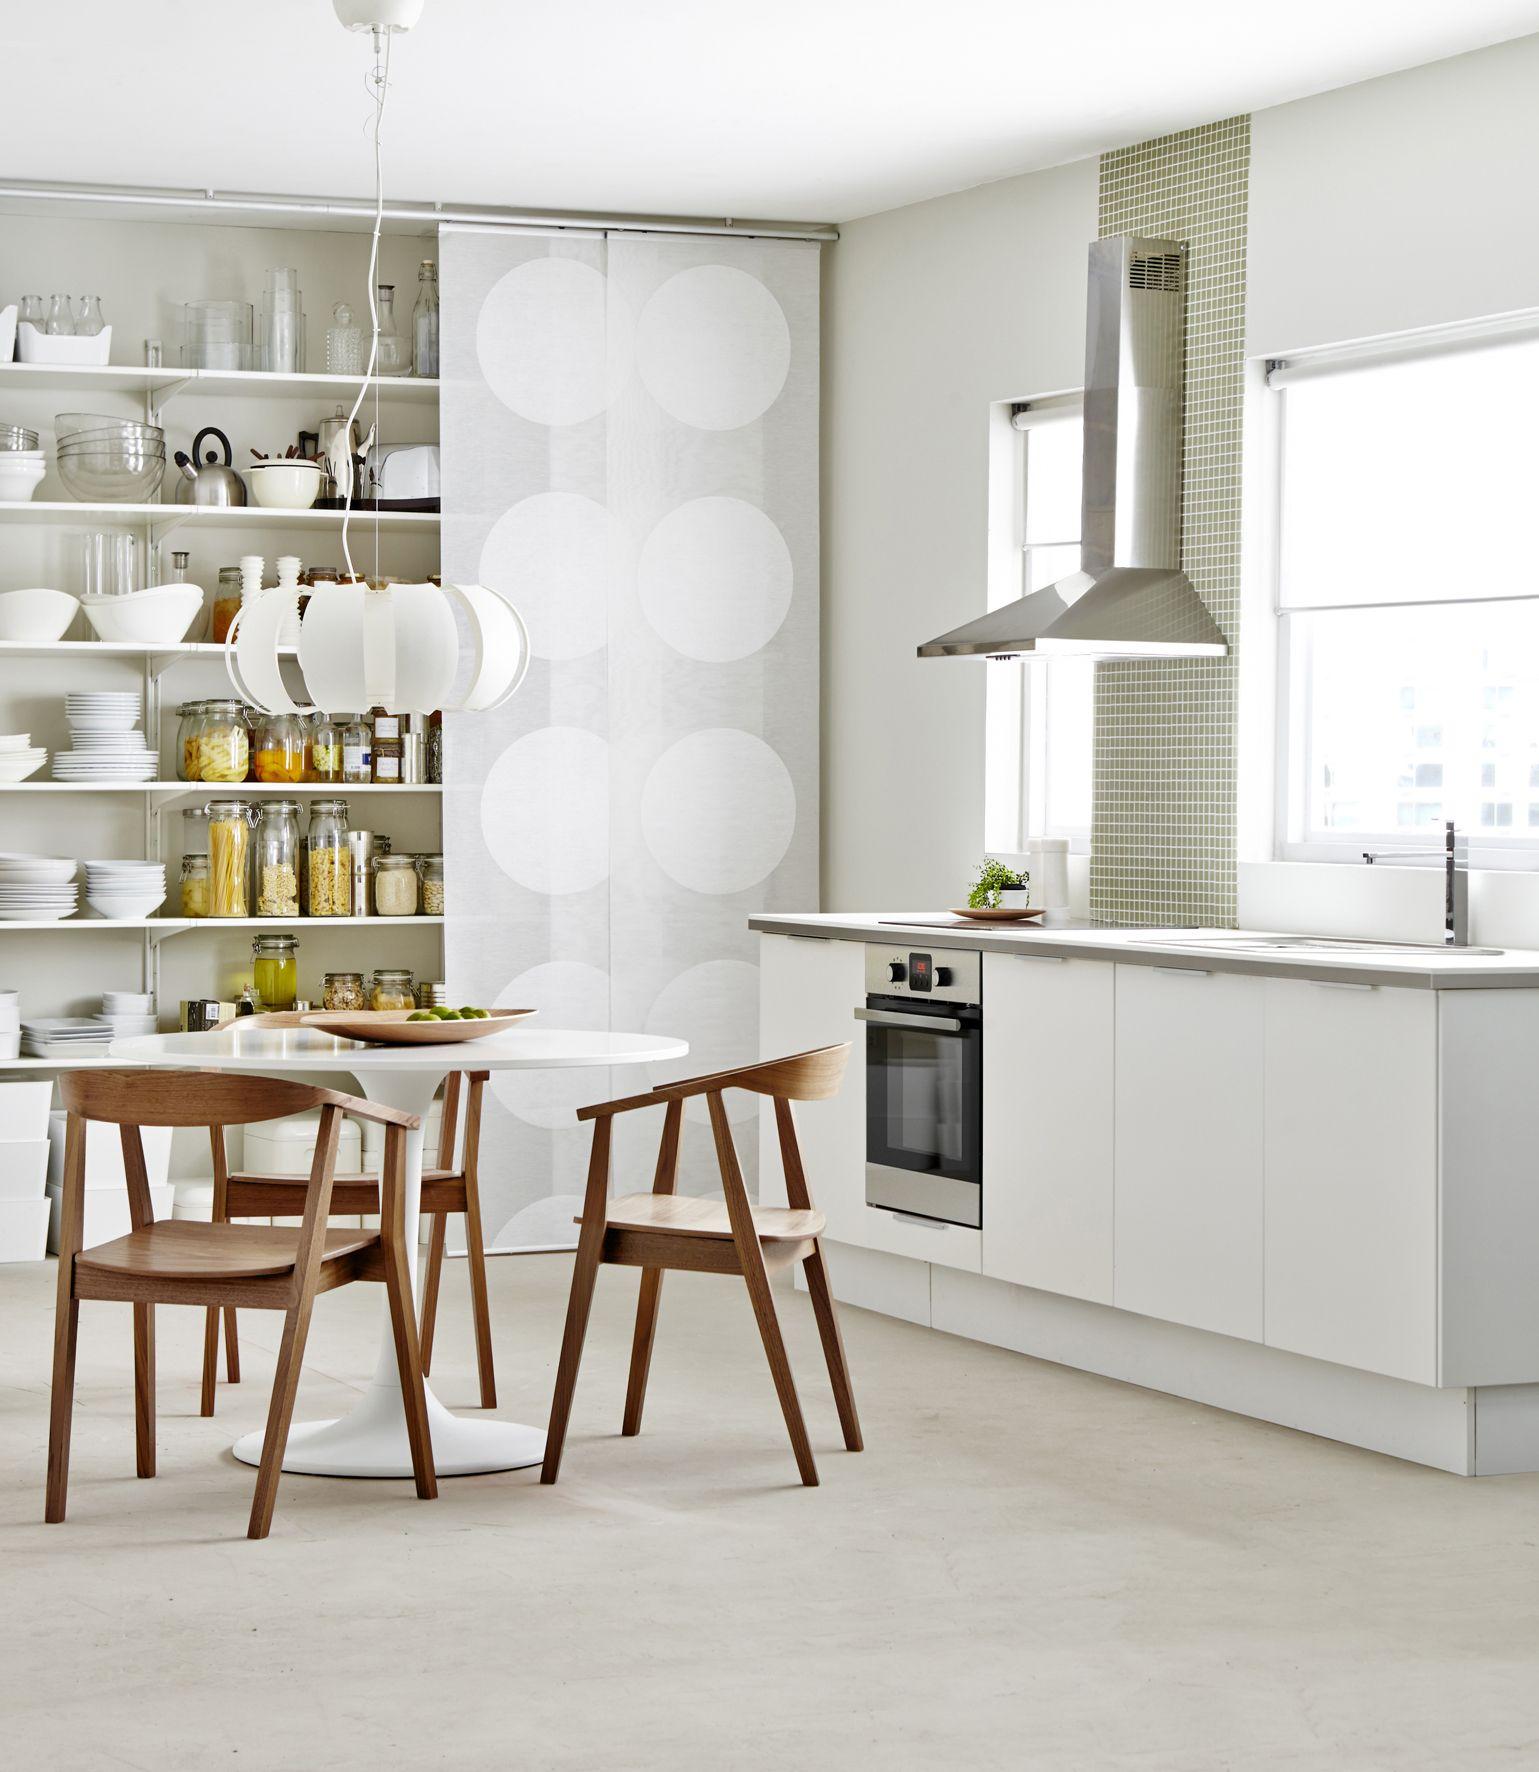 Ikea Keuken Wit Scandinavisch Interieur Faktum Keukensystemen Ikea